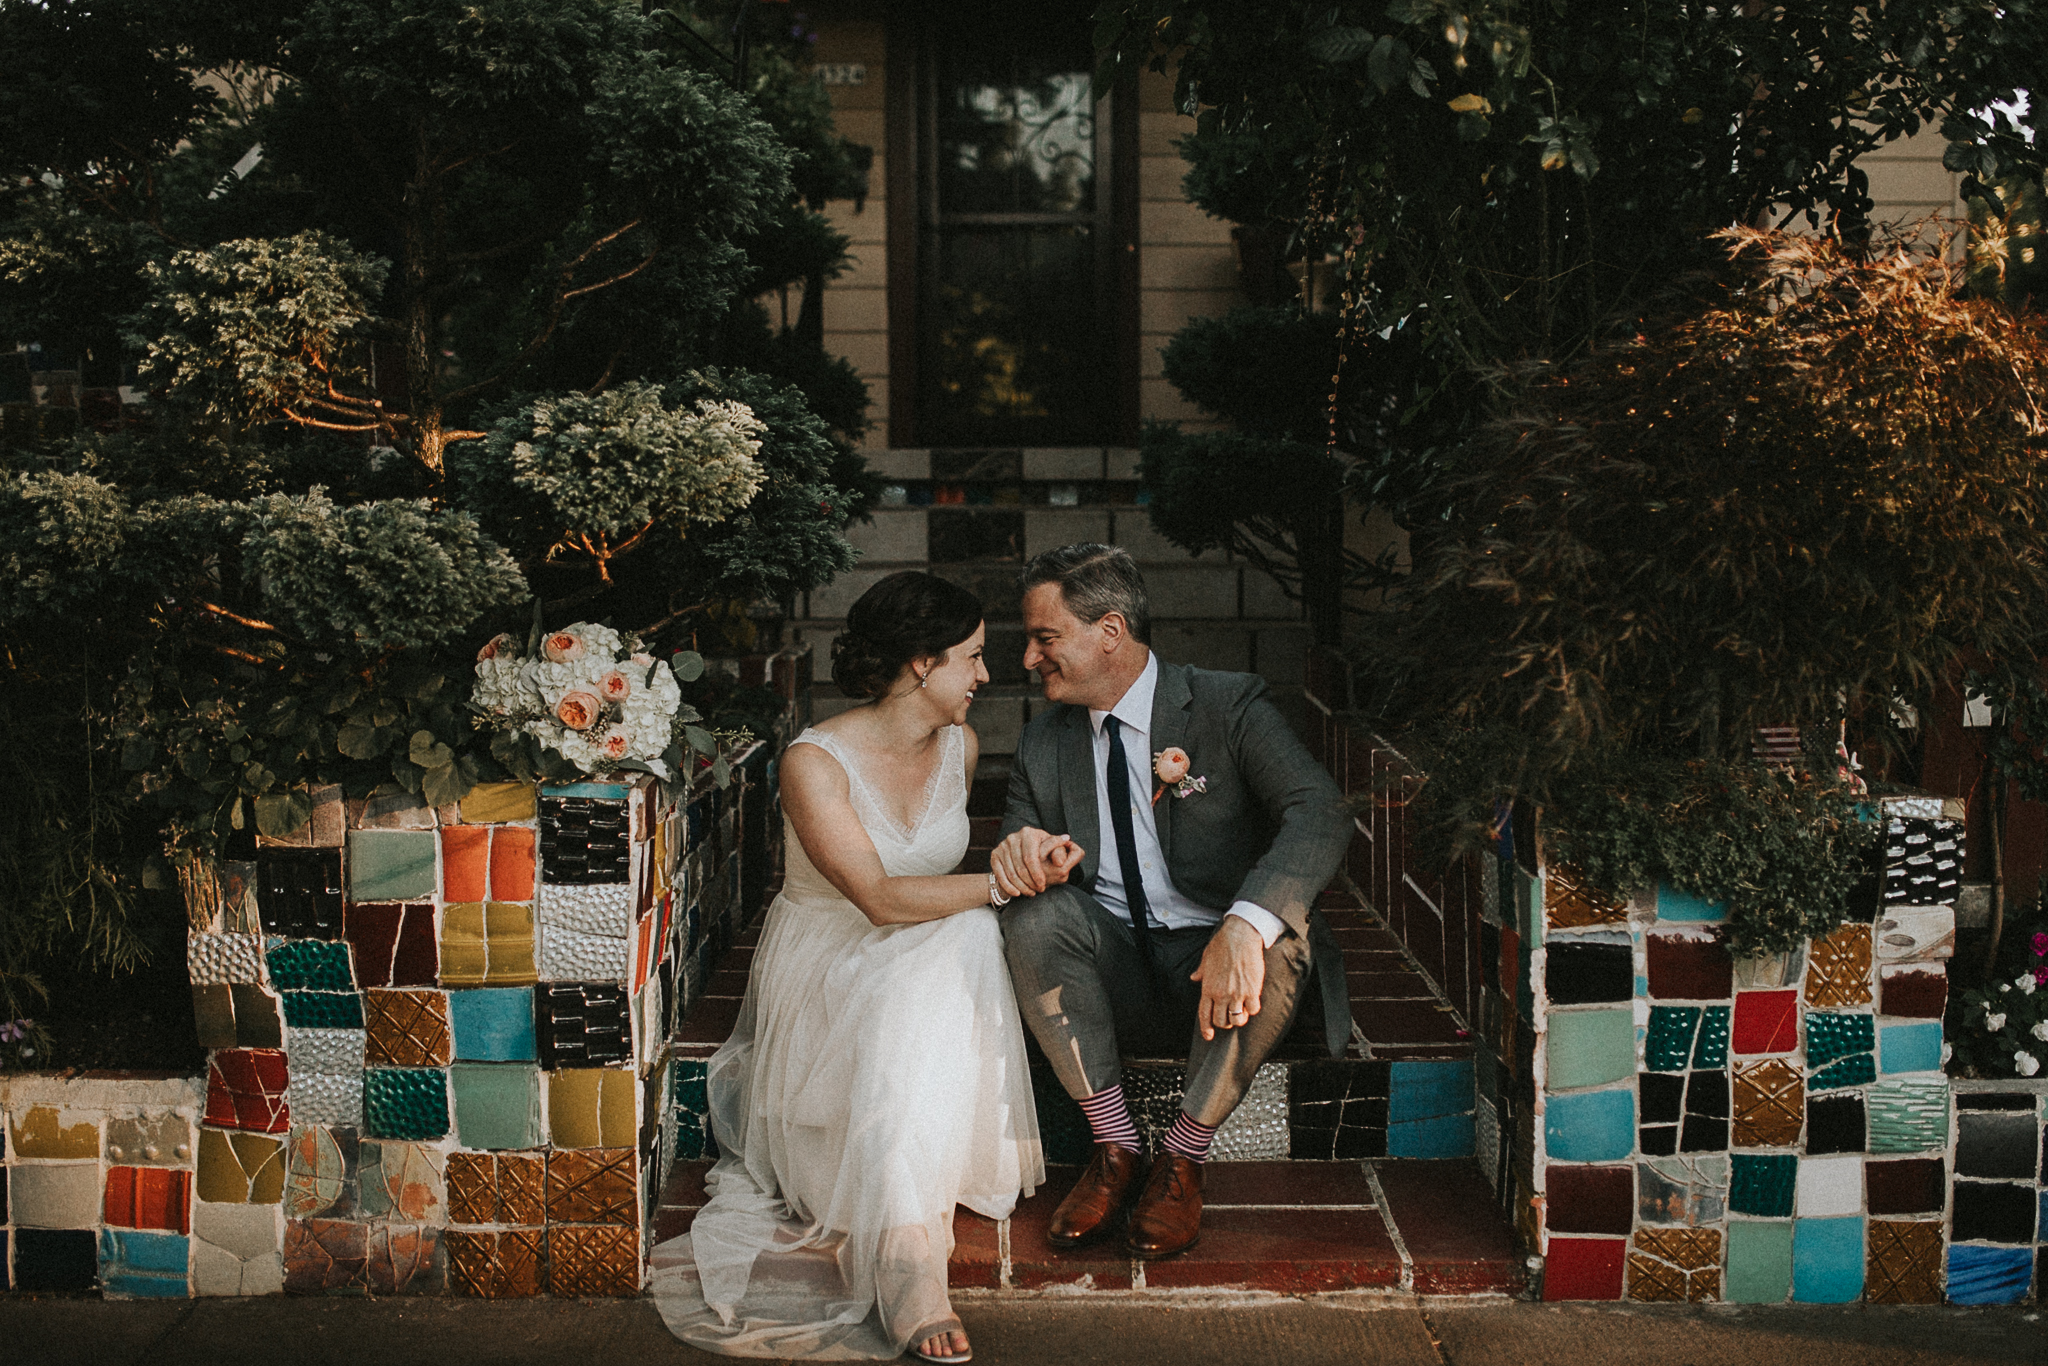 wedding-photojournalists-nashville-tn-33.jpg